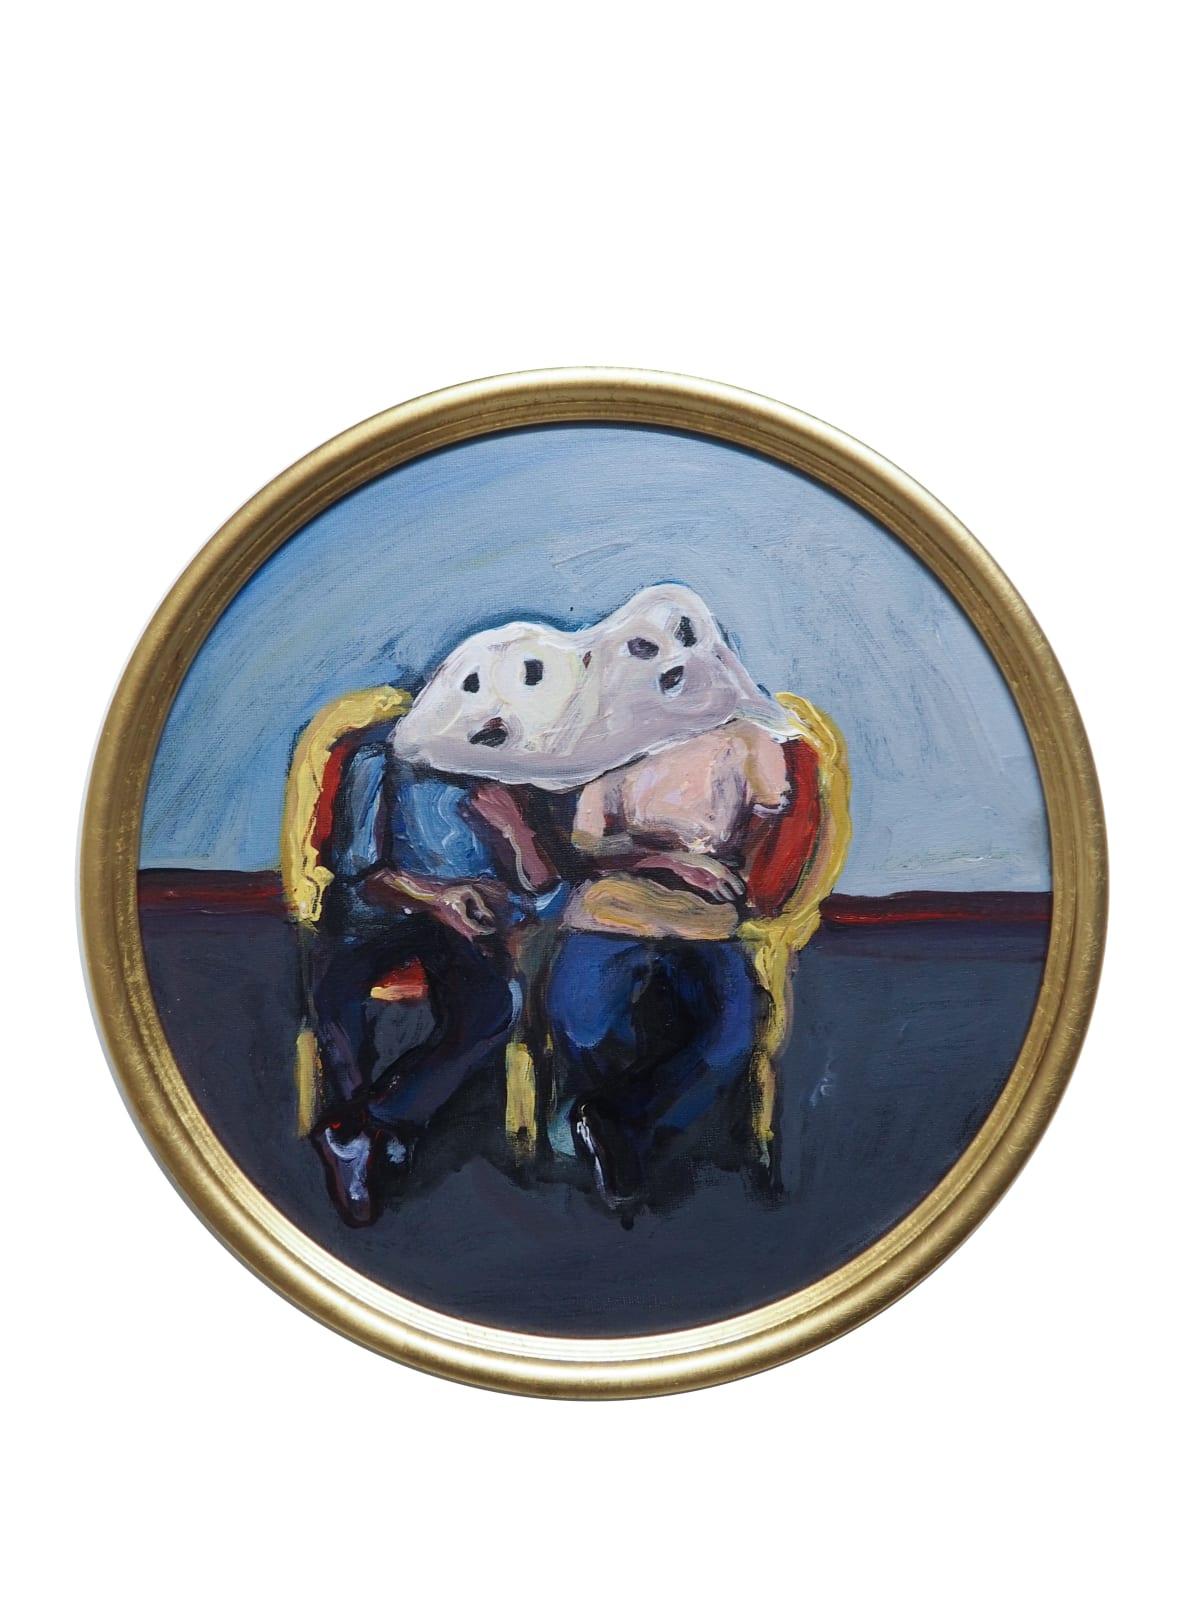 Yassine Balbzioui, twin ghost, 2018 Oil on board 33 cm (framed)